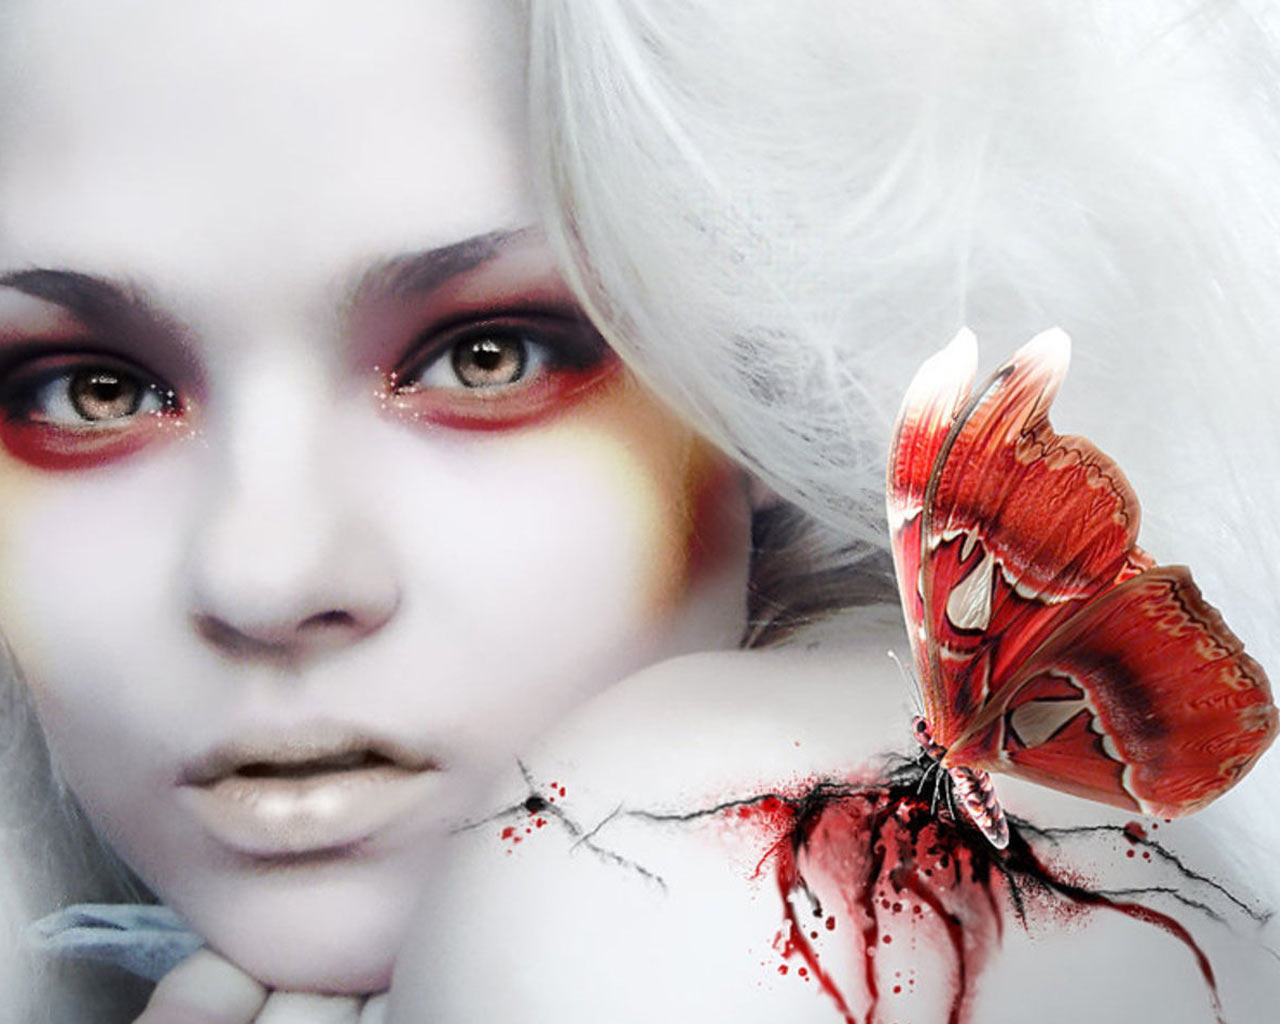 http://4.bp.blogspot.com/-LF6xG62iYSU/T__blMZF9HI/AAAAAAAADY8/VQQBsyaoDlw/s1600/Vampire_Weekend-Wallpaper.jpg